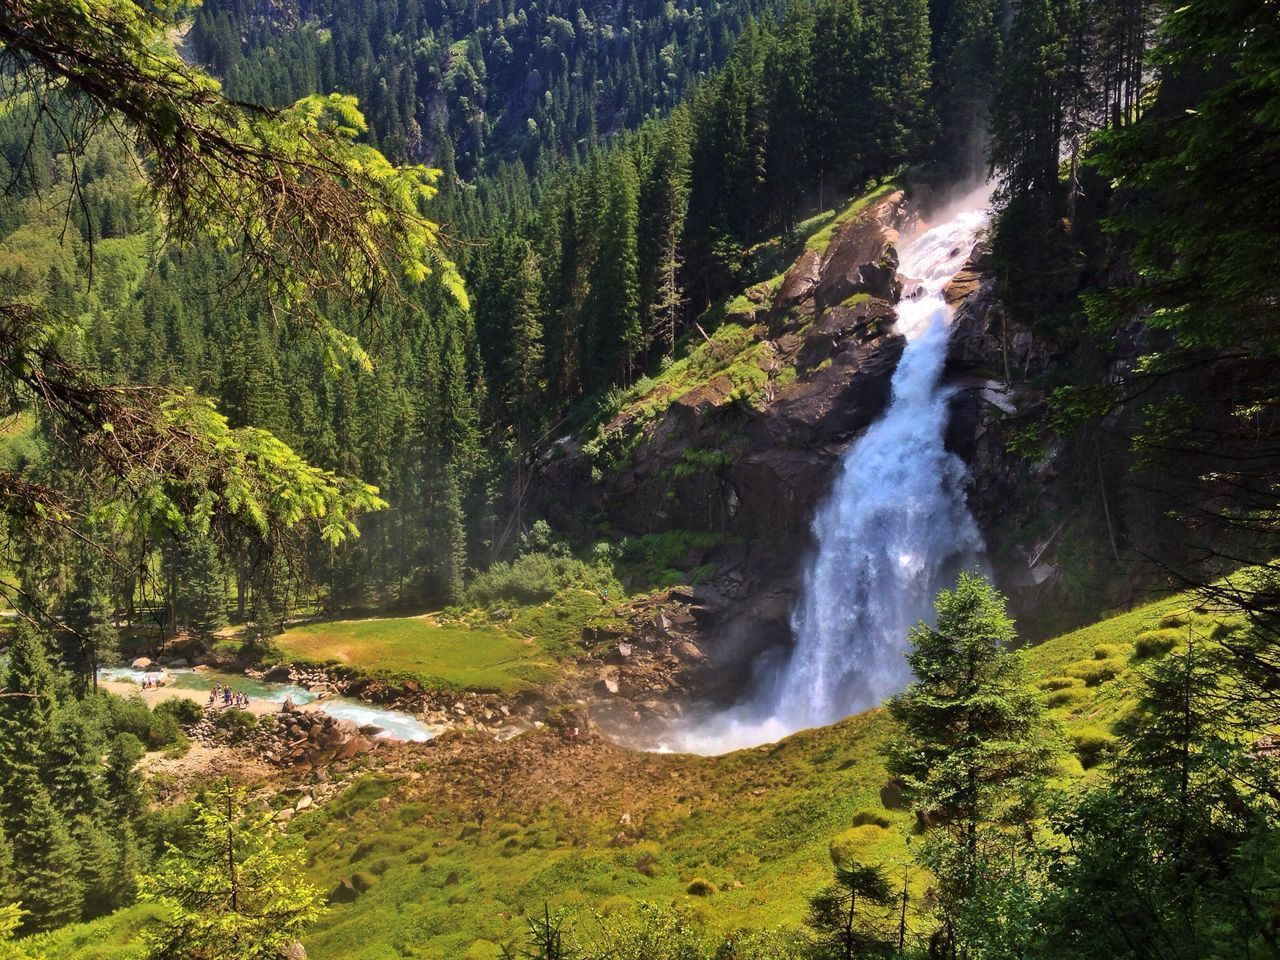 Krimmler Wasserfälle Krimmler Krimml Wasserfall Österreich Austria Waterfall Waterfalls Water National Nationalpark HoheTauern Wandern